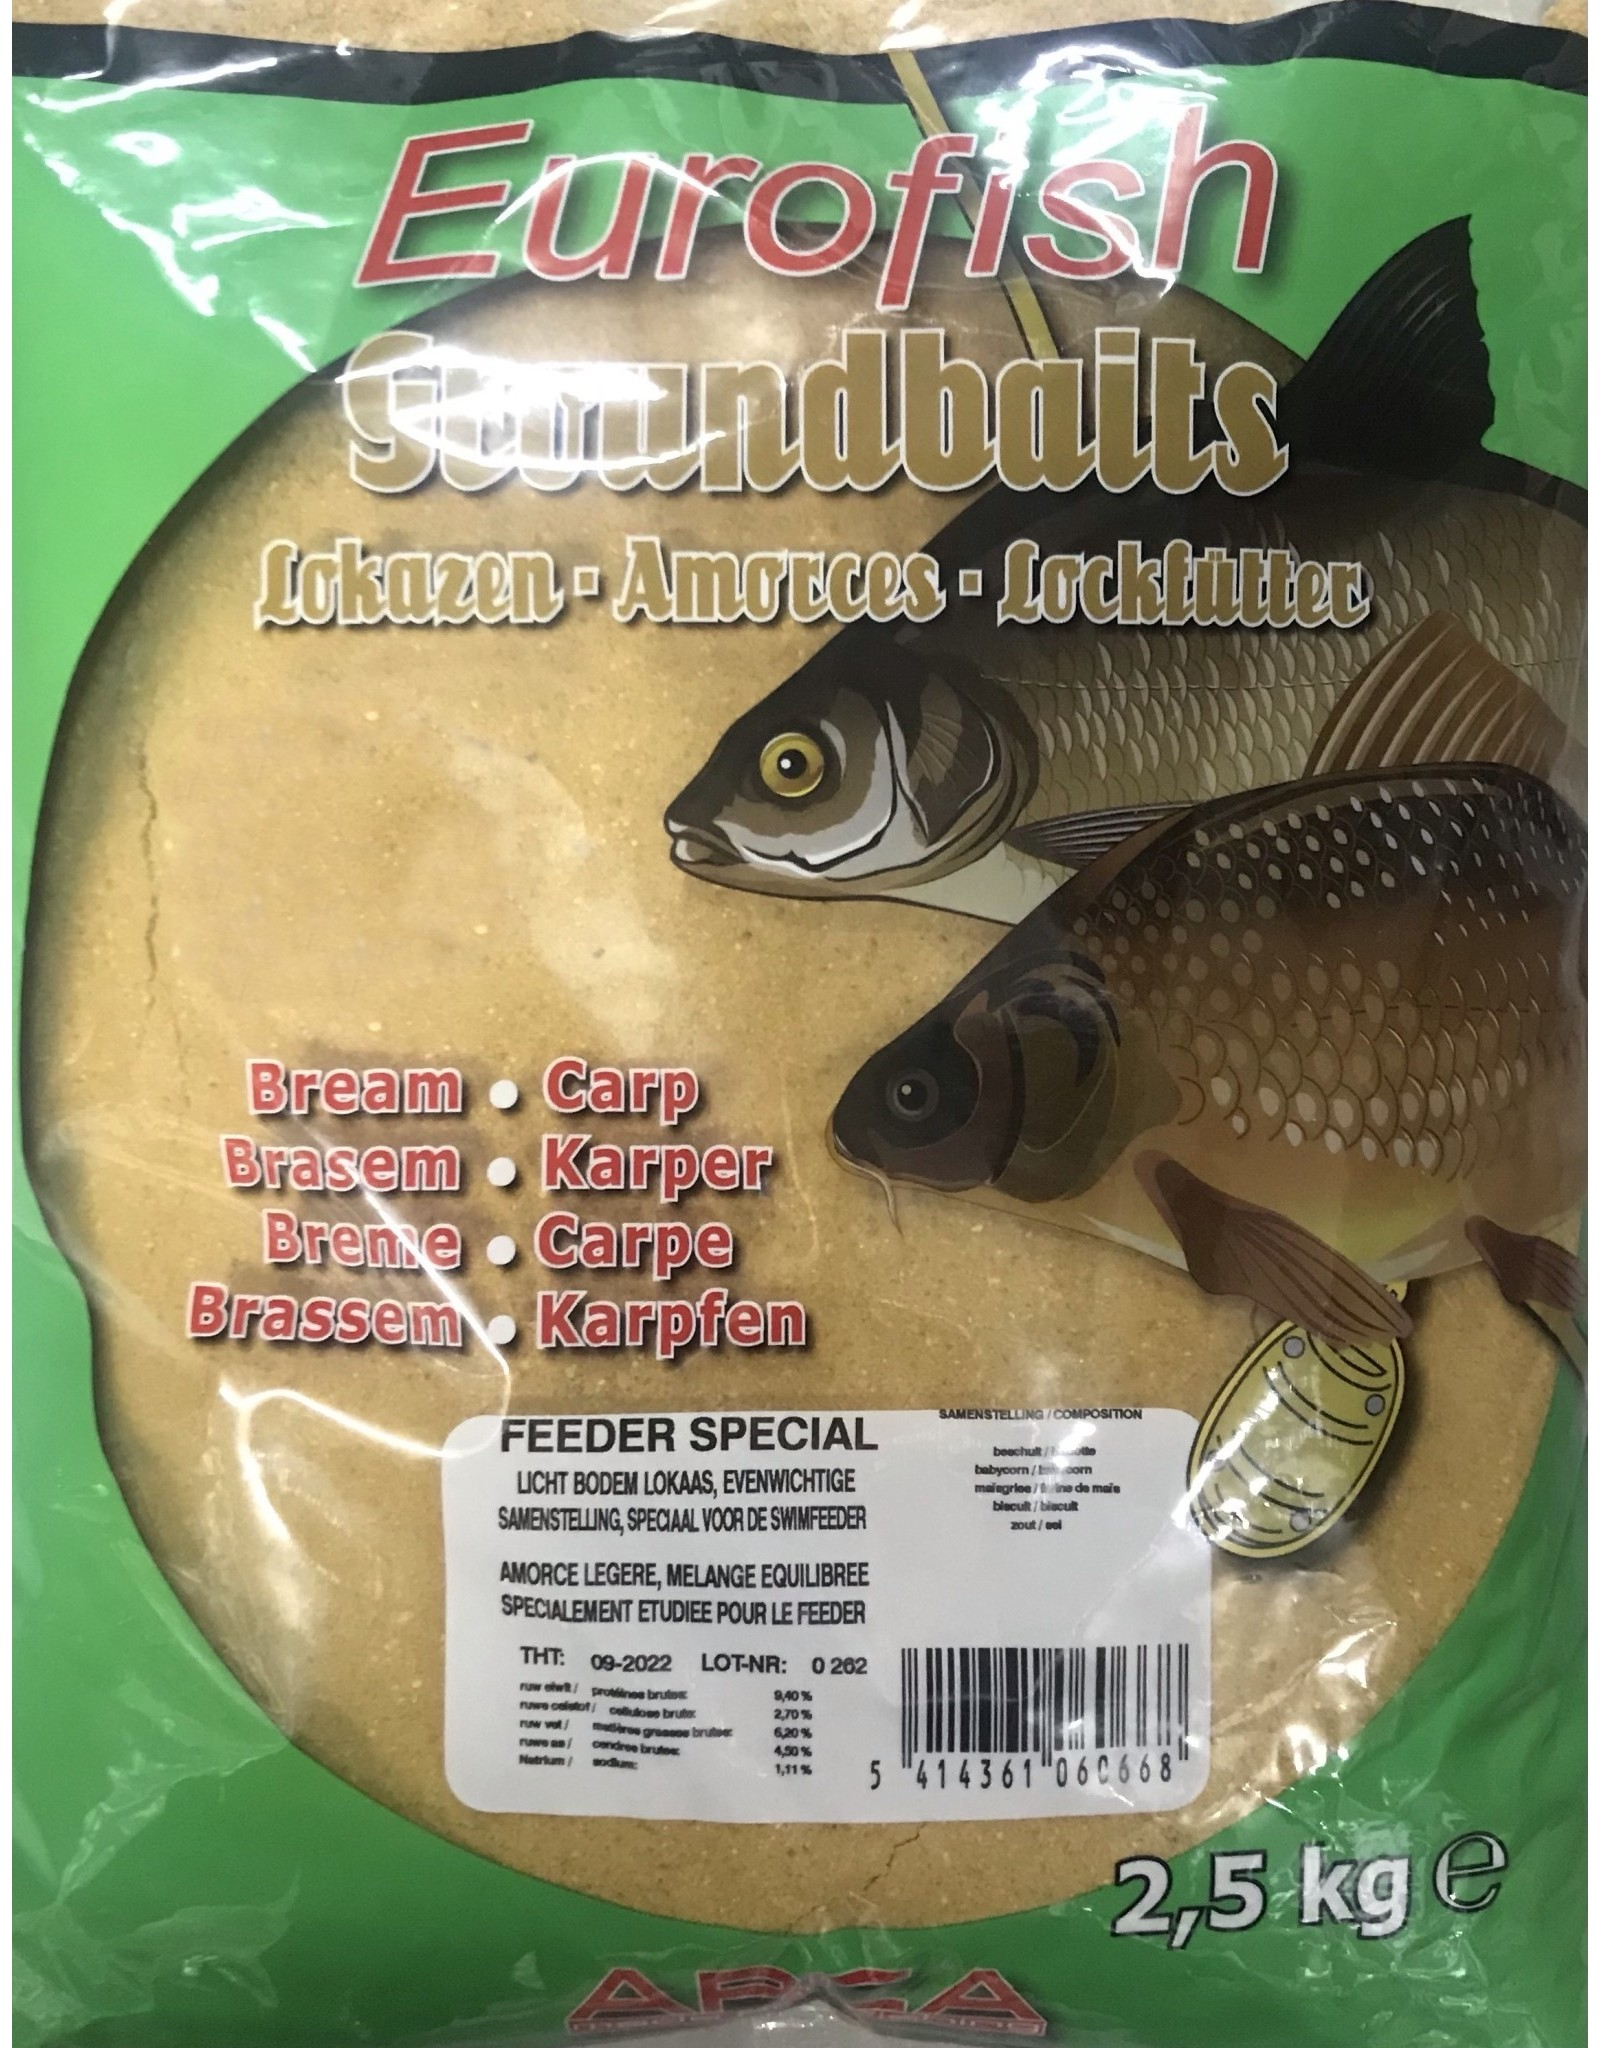 EUROFISH SPECIAL FEEDER 2,5 KG